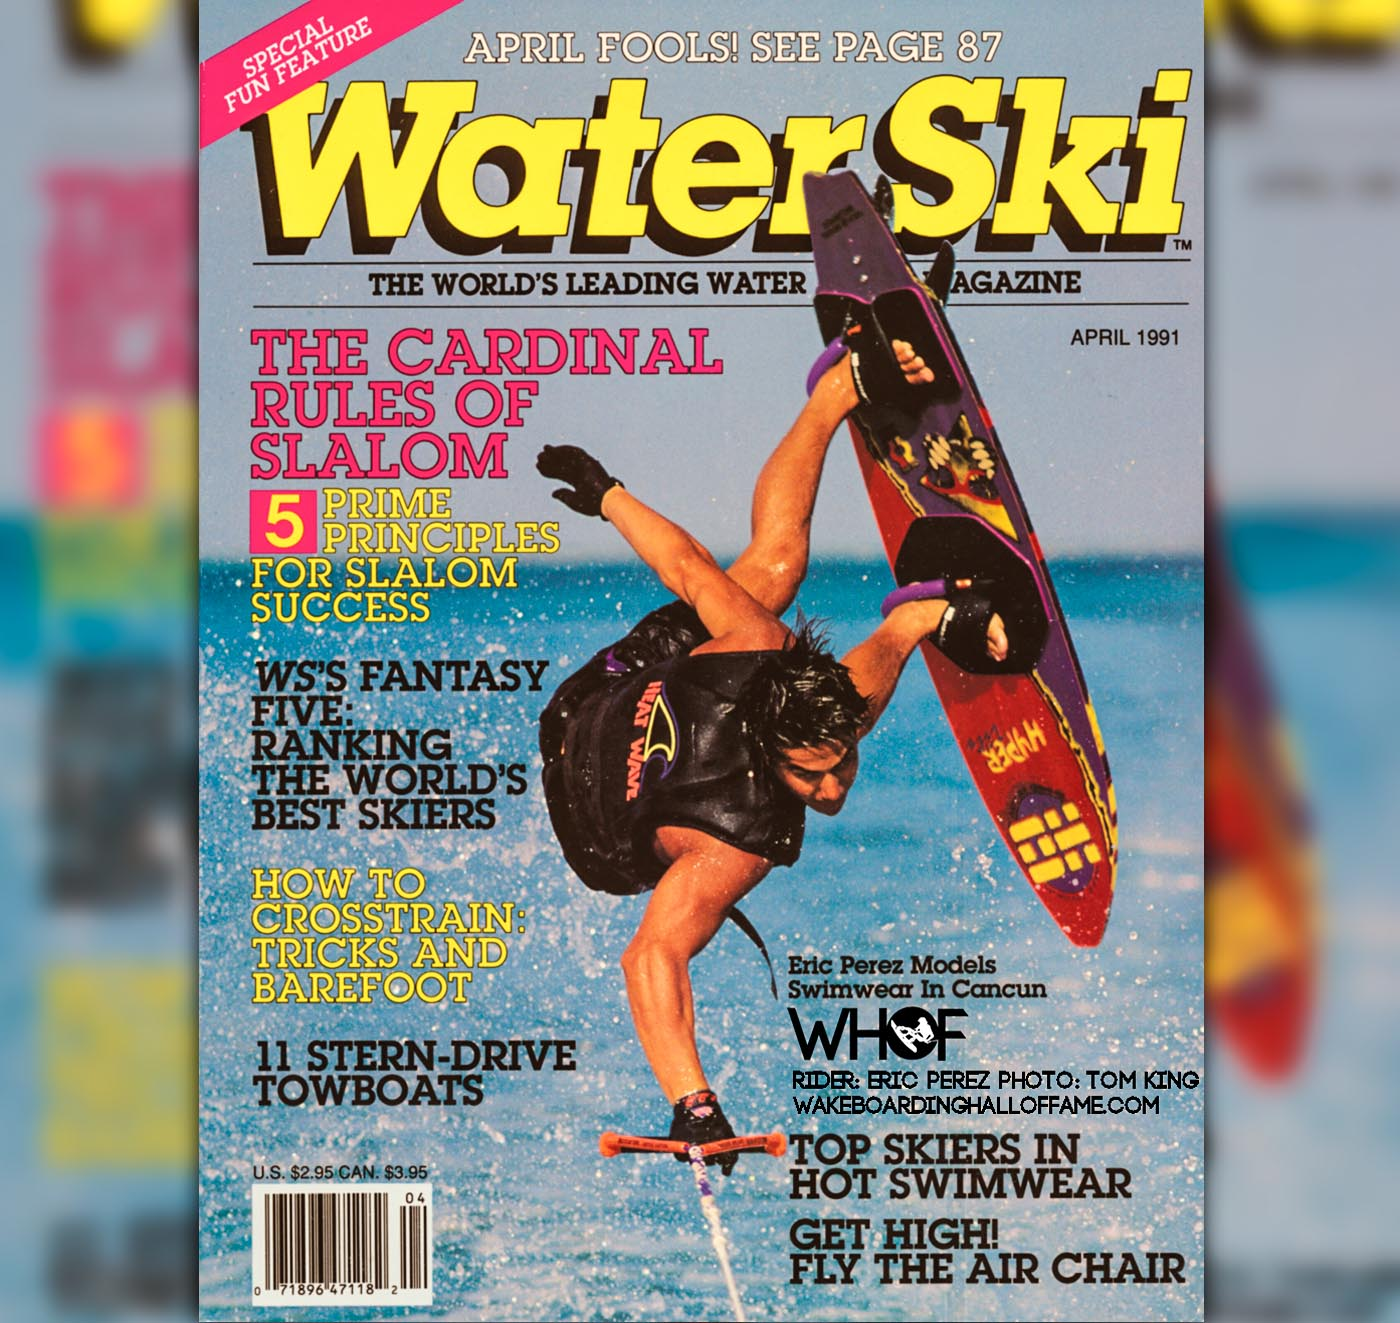 Eric Perez 1991 Water Ski Magazine Cover Hyperlite Tom King WEB